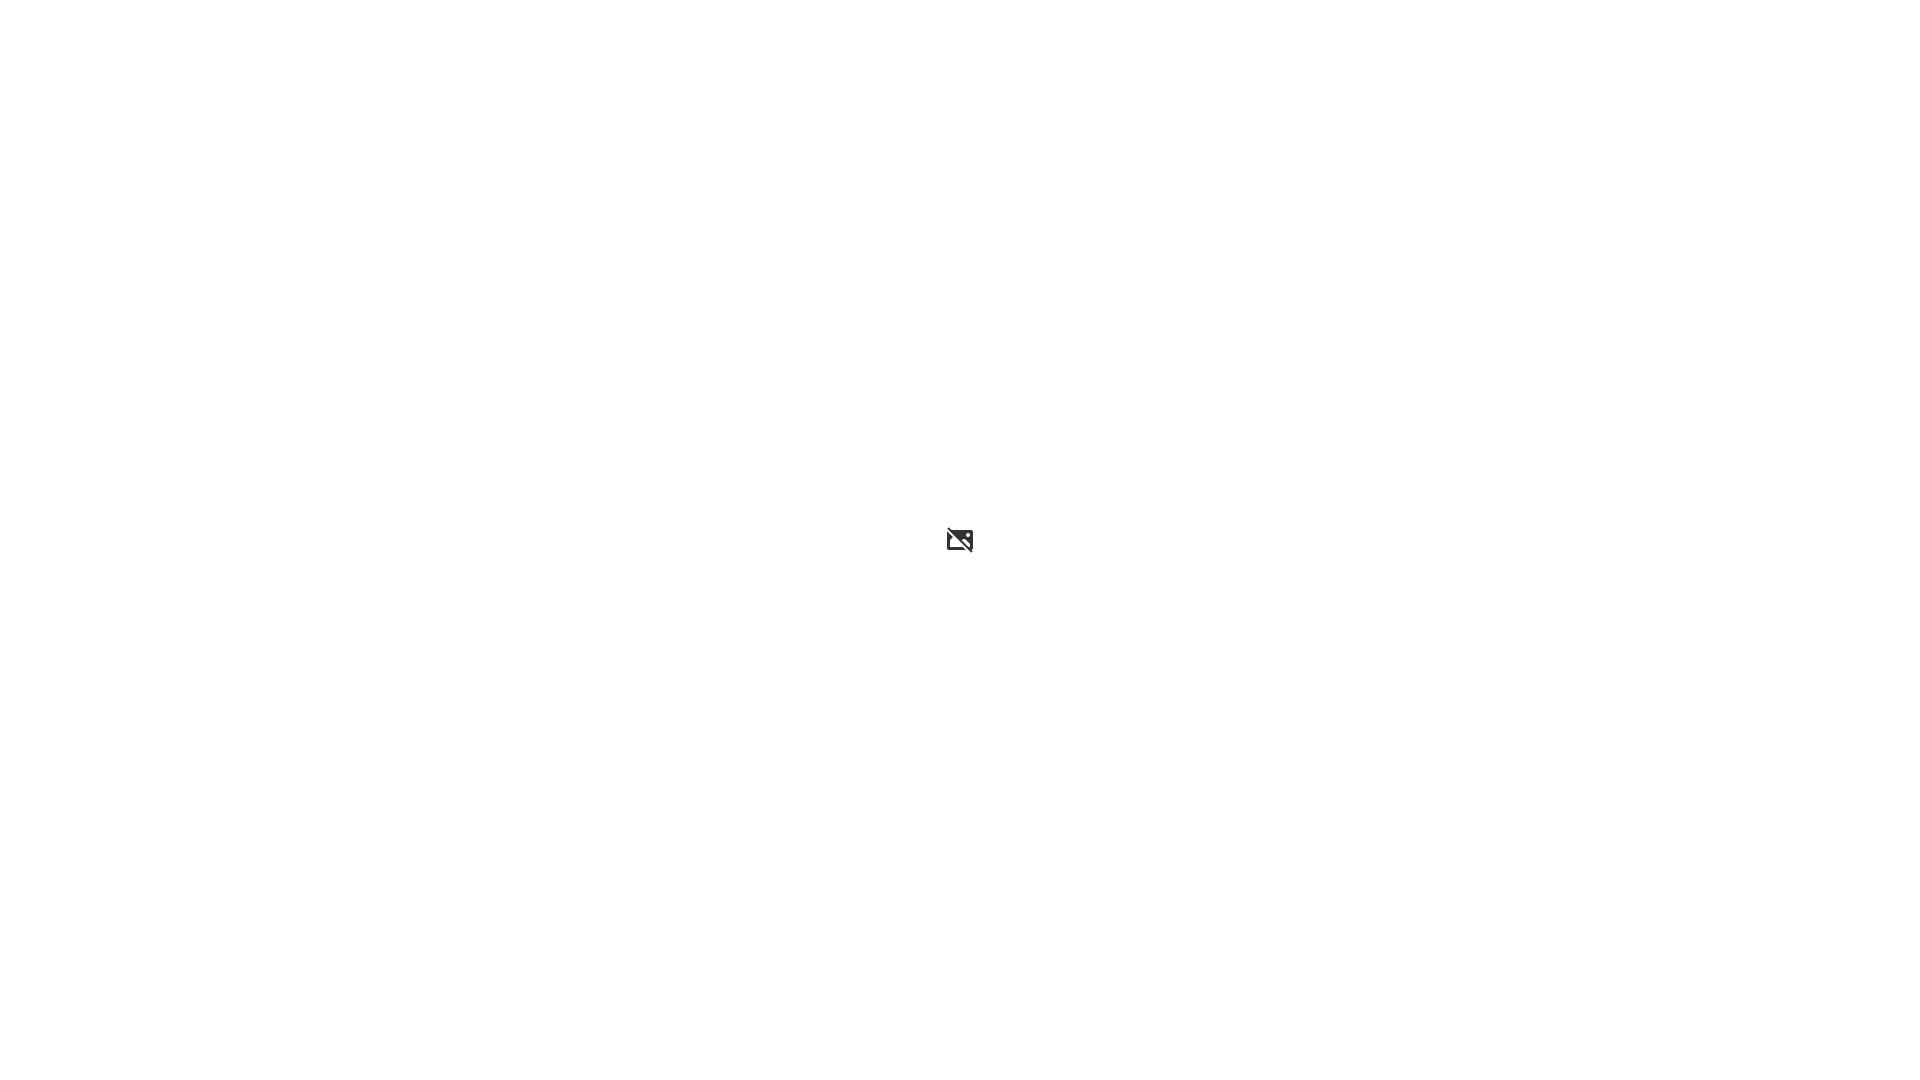 caitlyn_wallpaper__1920x1080__by_miniathril-d84f029